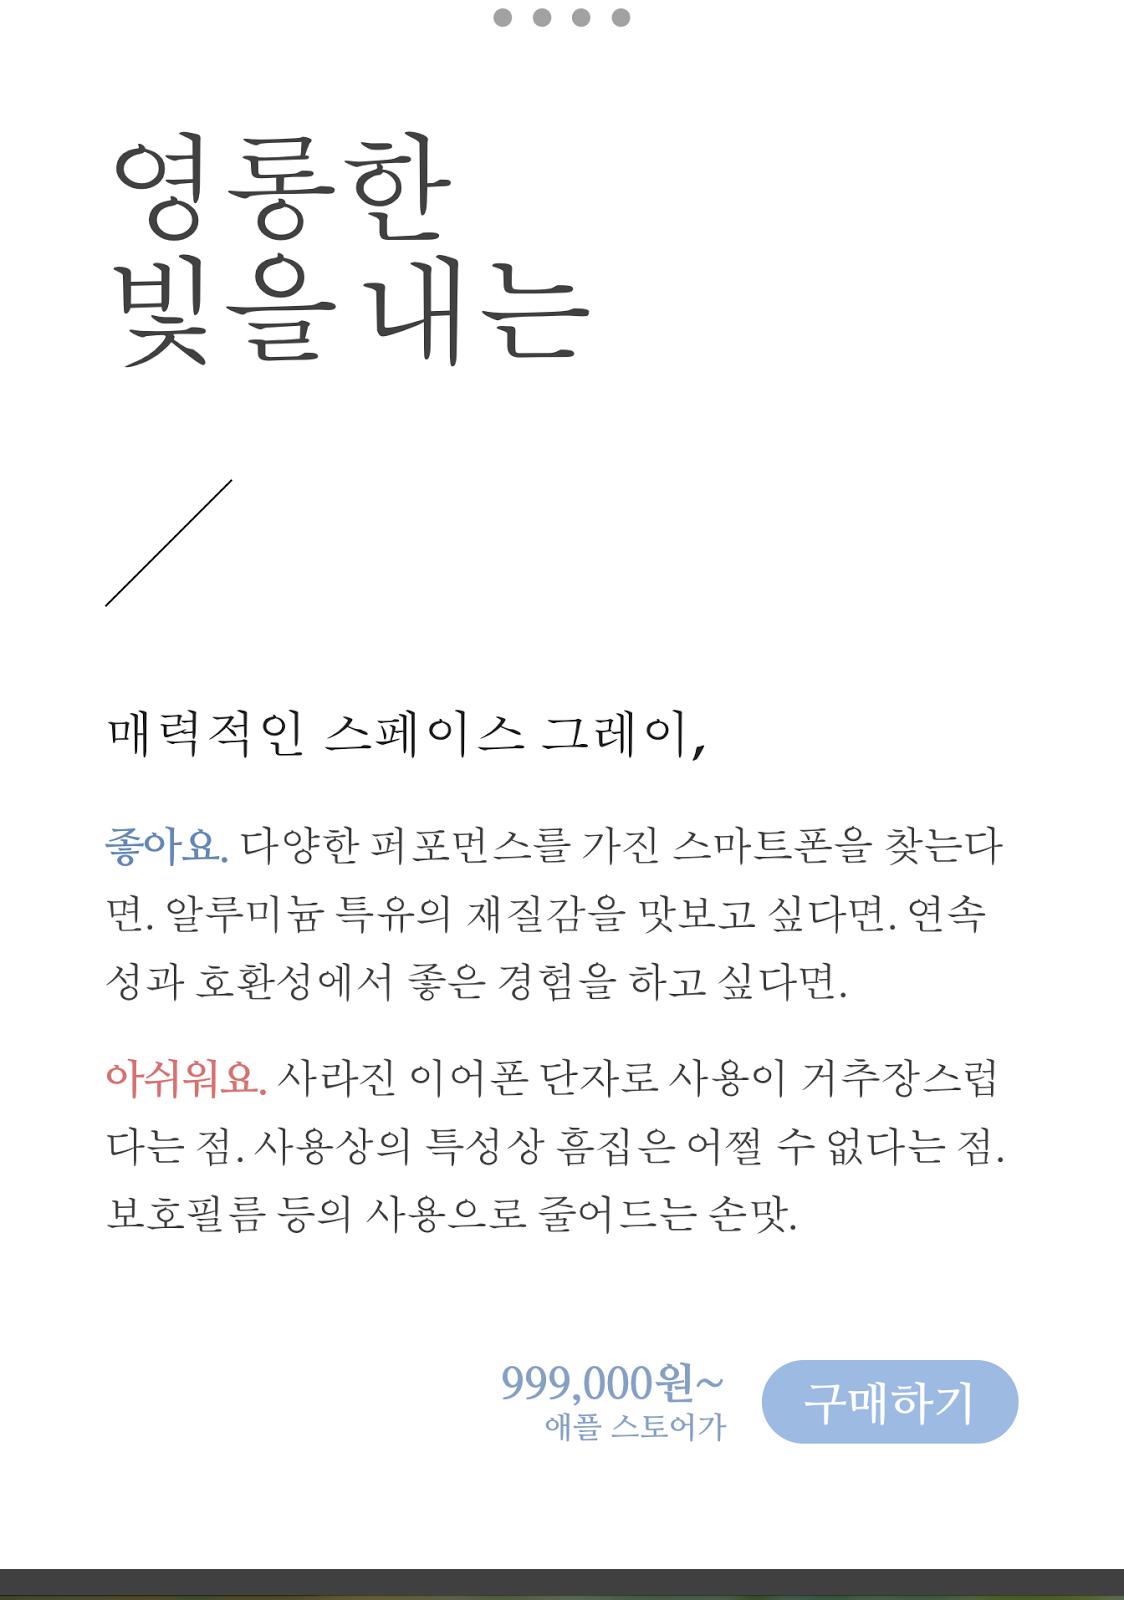 https://www.apple.com/kr/shop/buy-iphone/iphone-8